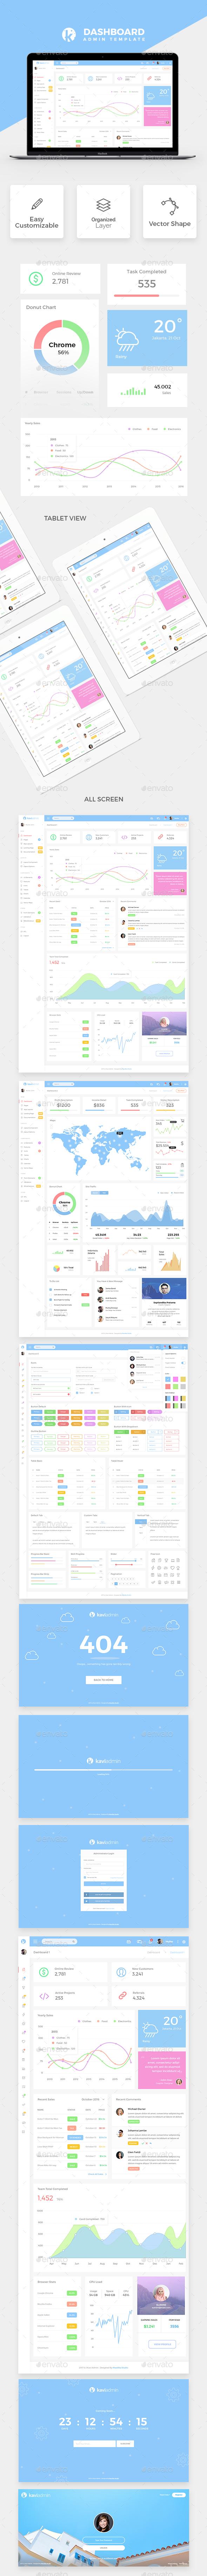 Kavi Admin Dashboard Template - User Interfaces Web Elements